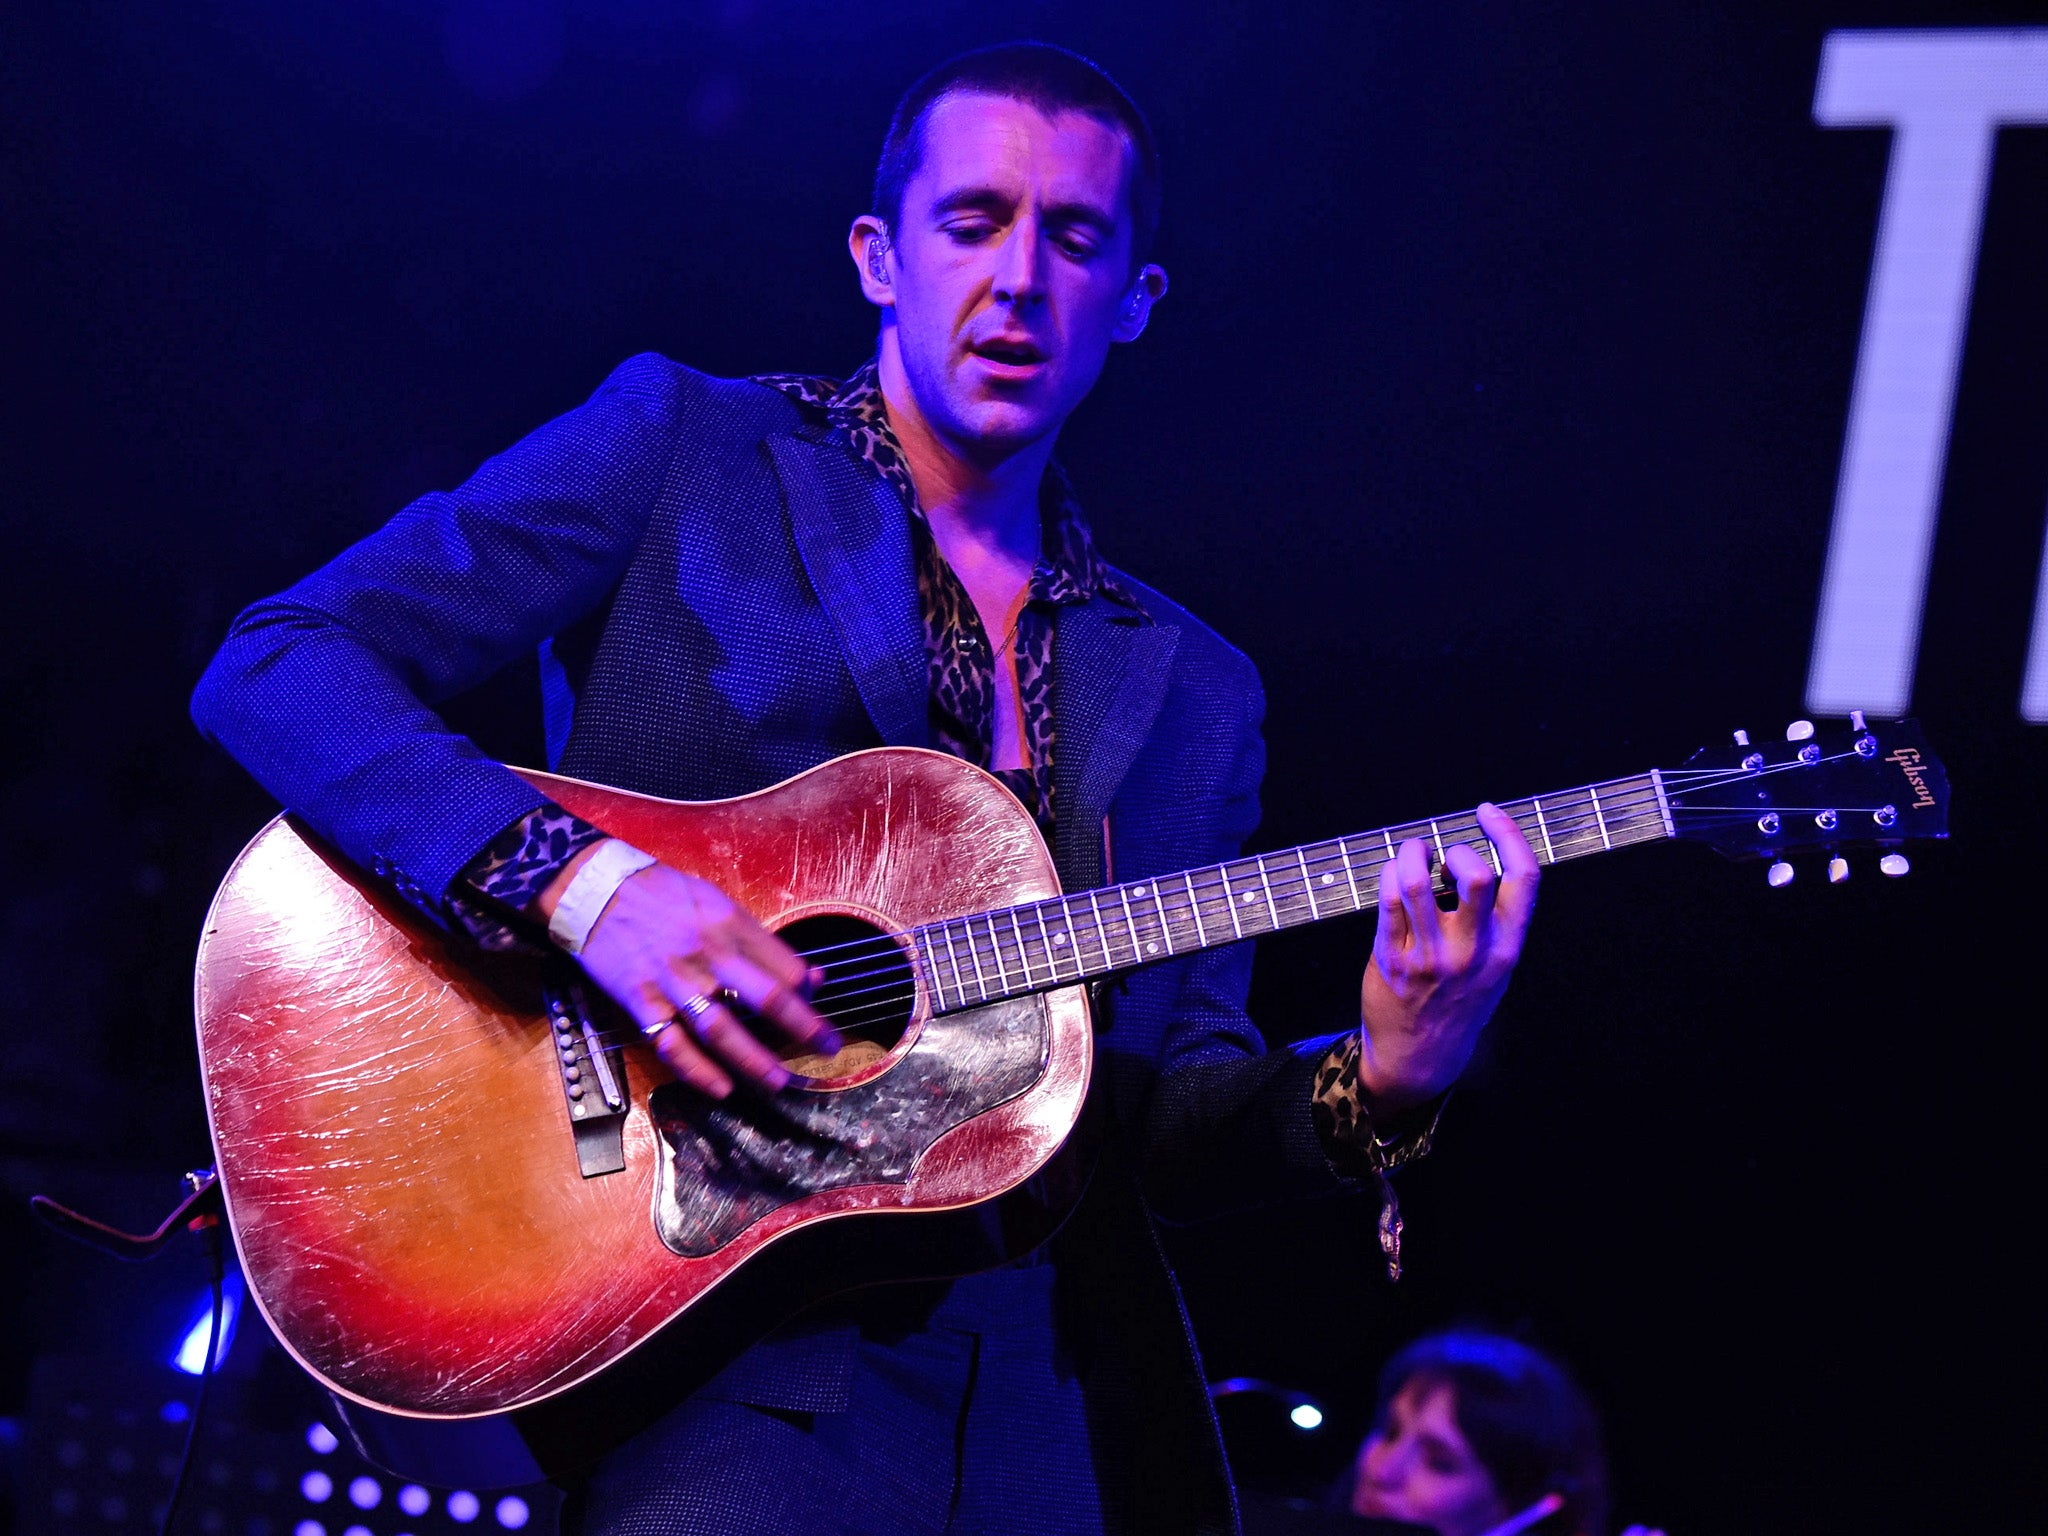 Miles Kane announces new tour dates as he works on upcoming album